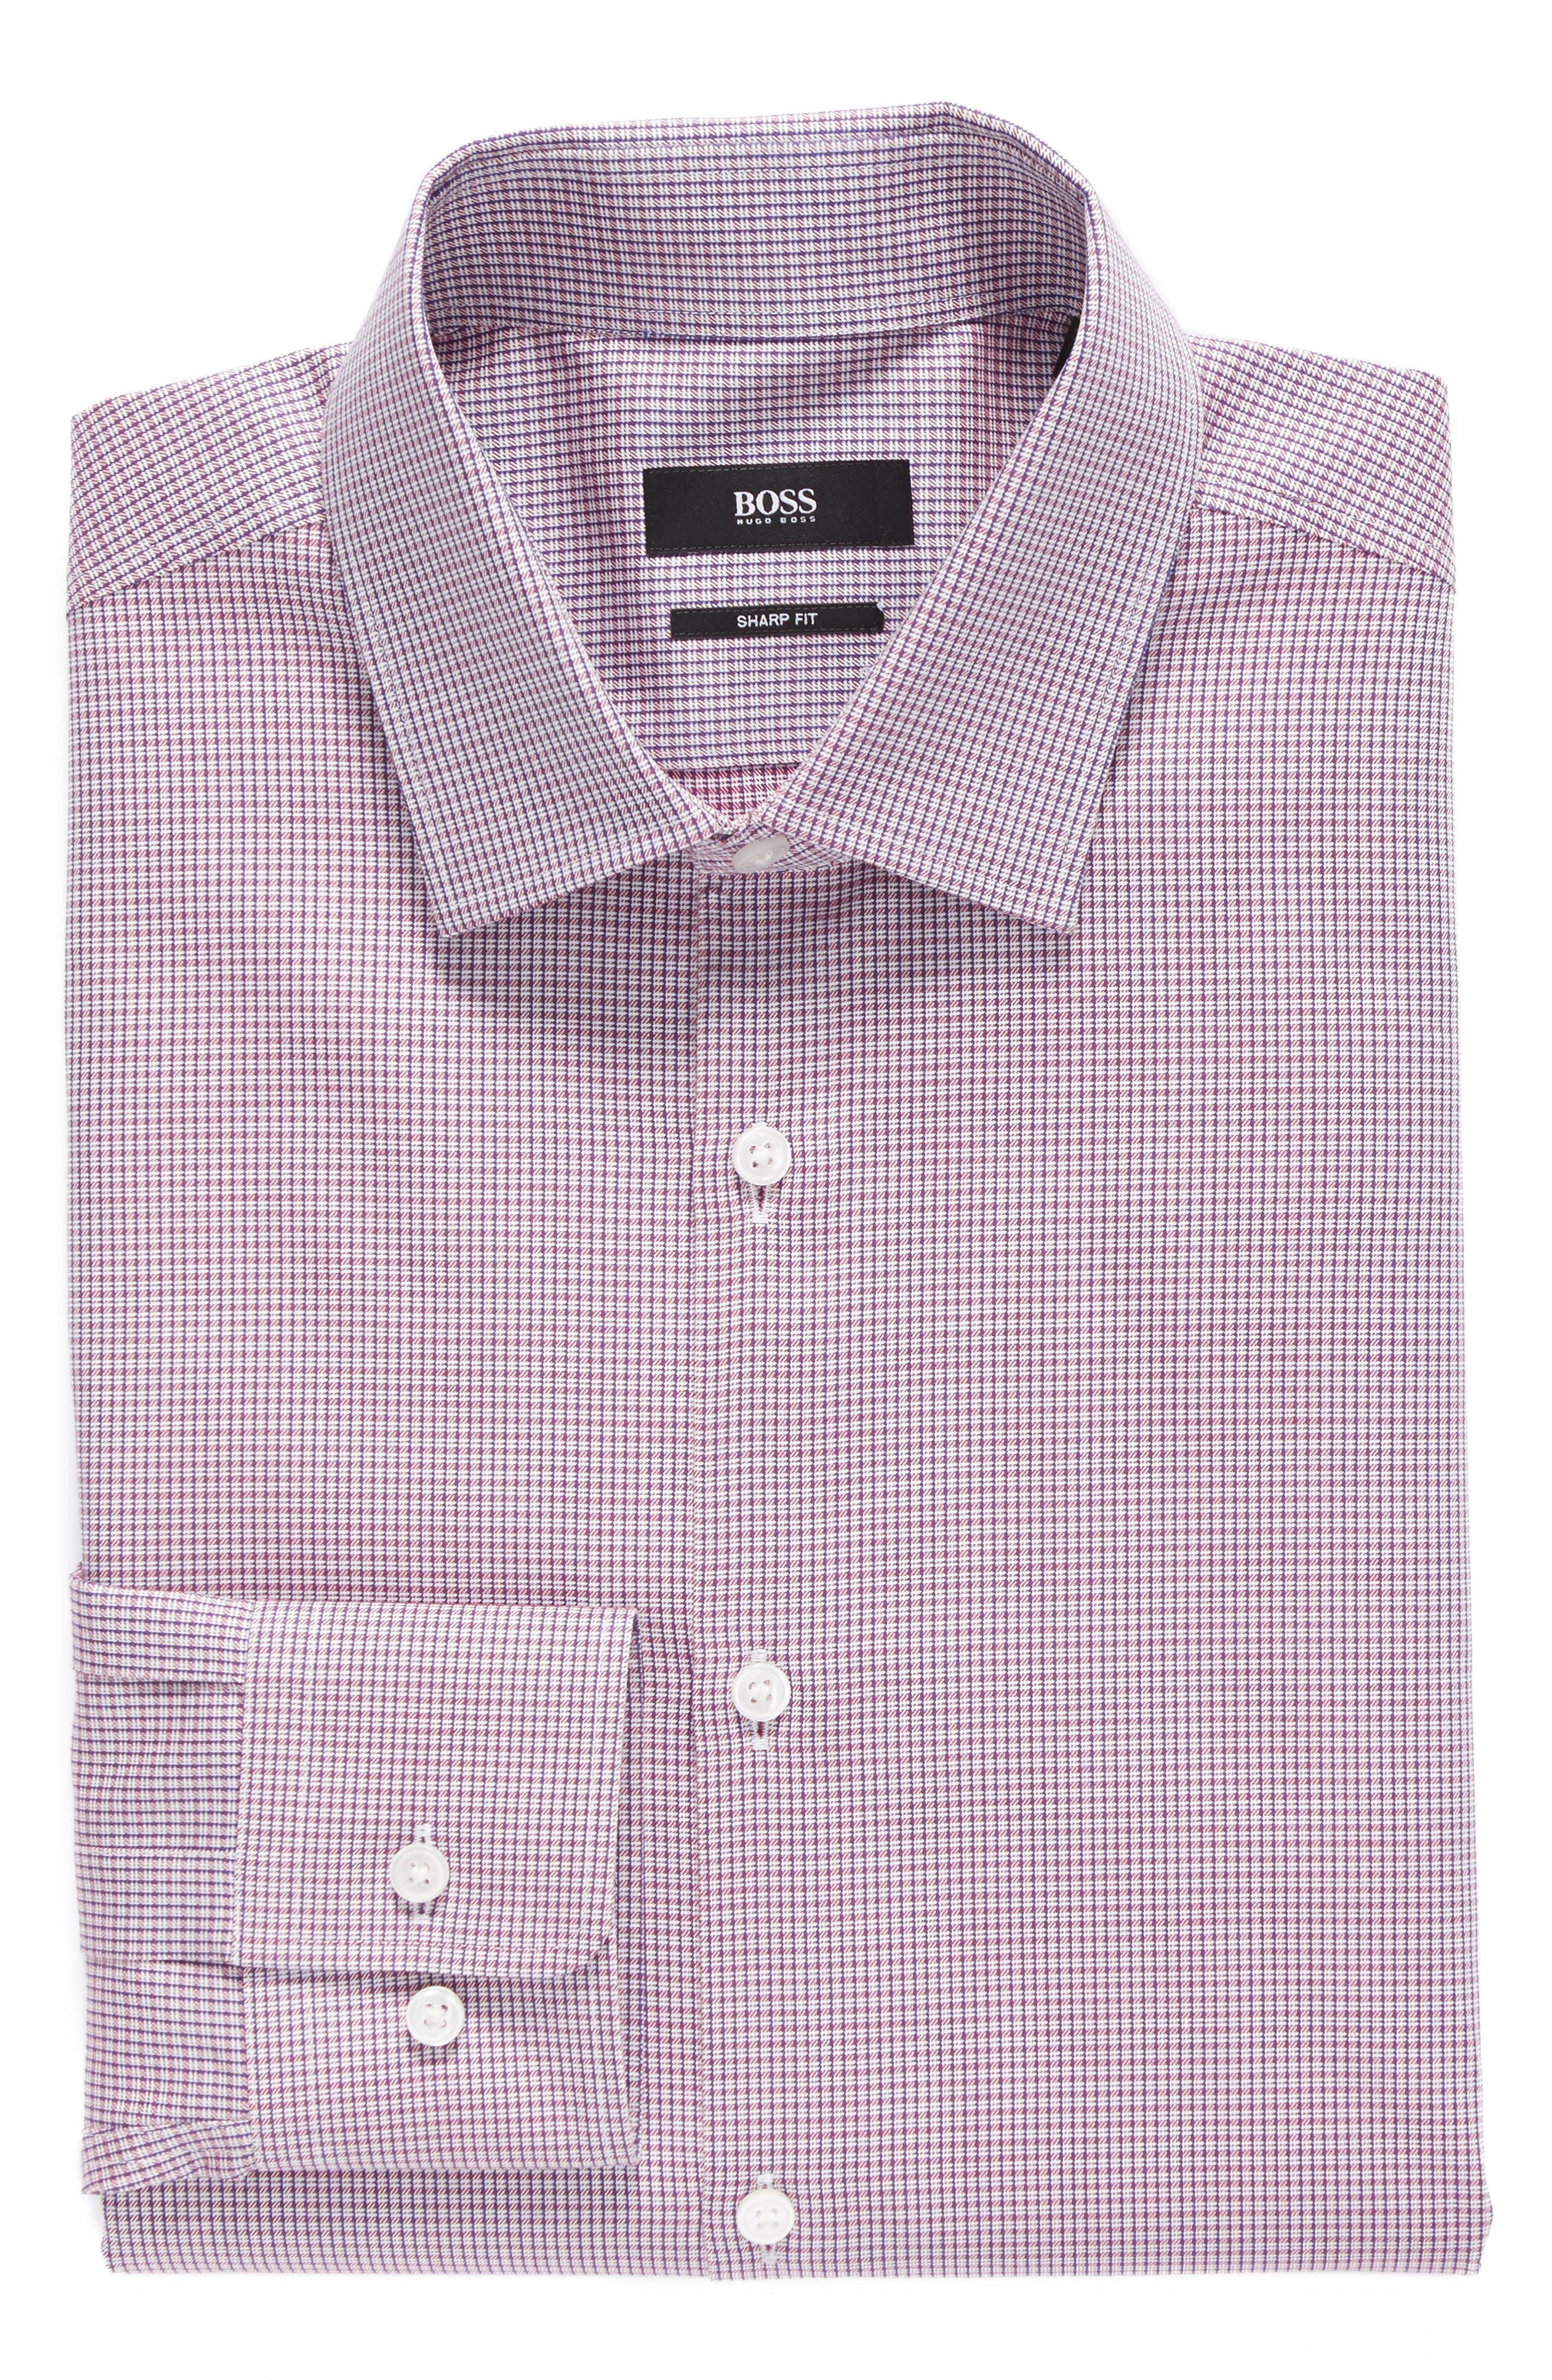 Alternate Image 1 Selected - BOSS Sharp Fit Check Dress Shirt